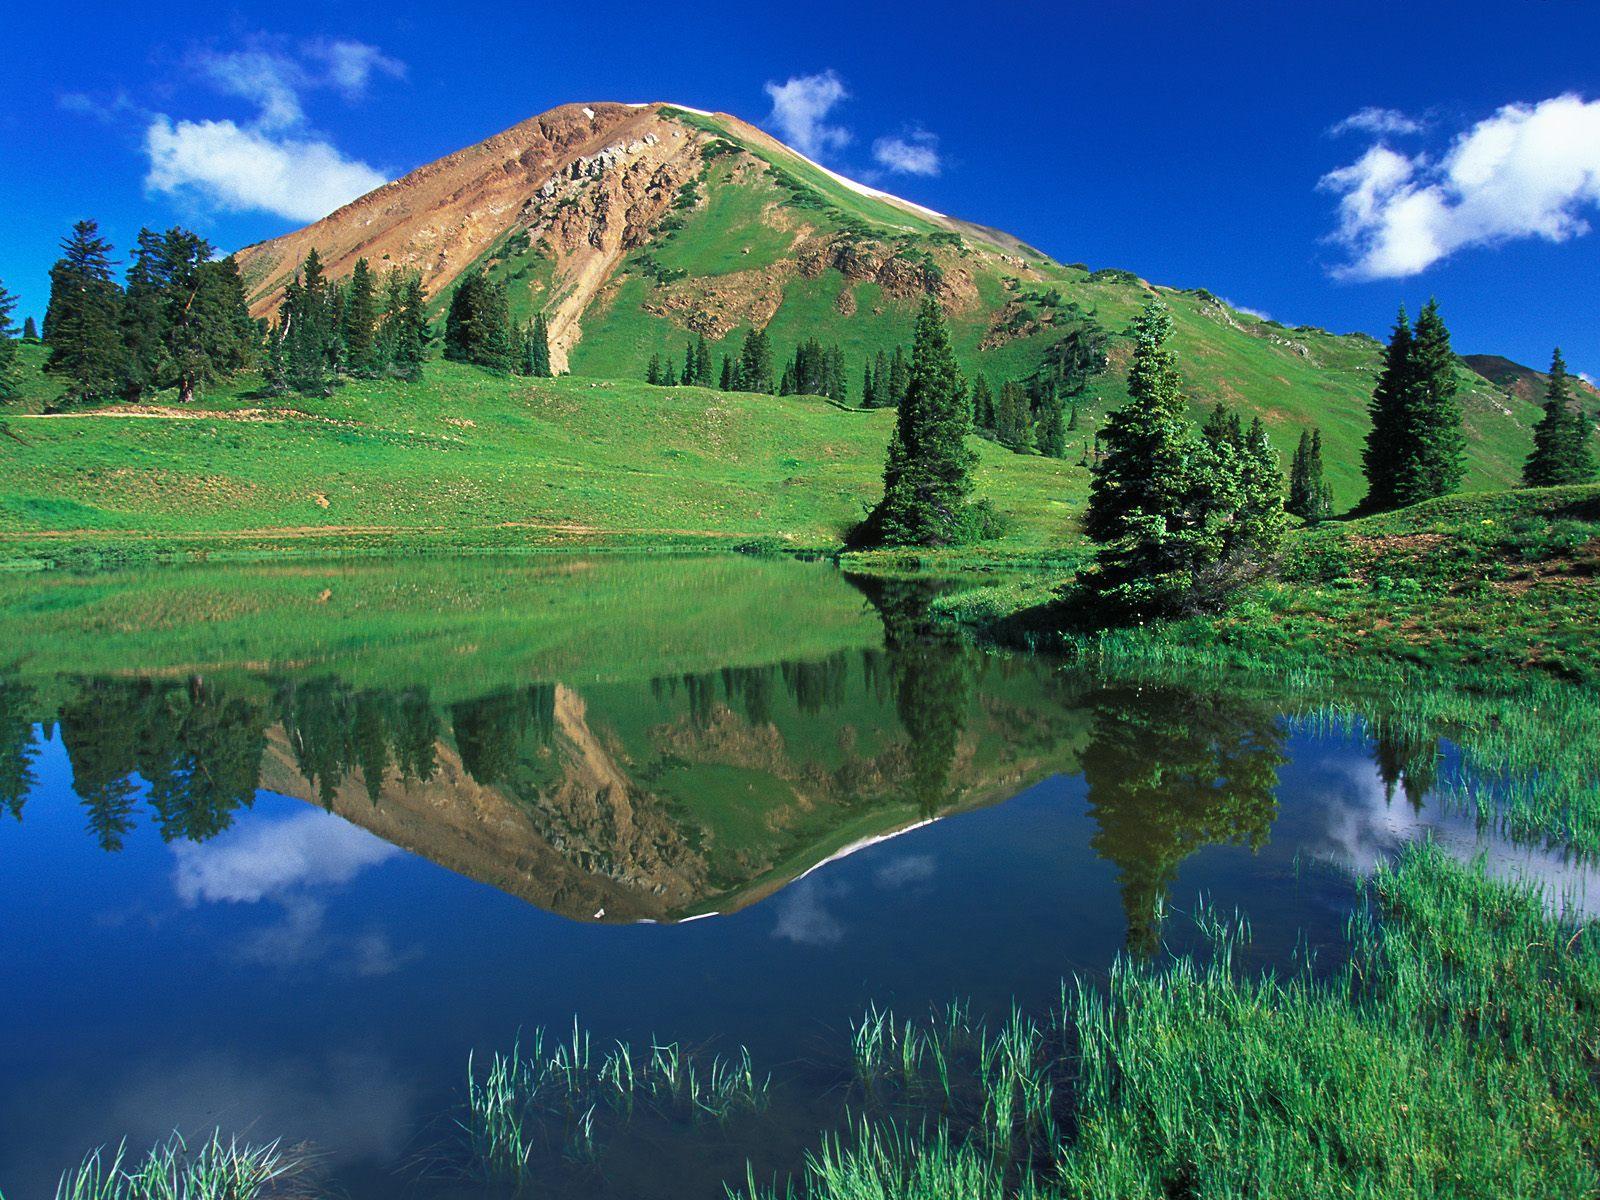 Green Mountain wallpaper Download Nature Green Mountain Background 1600x1200